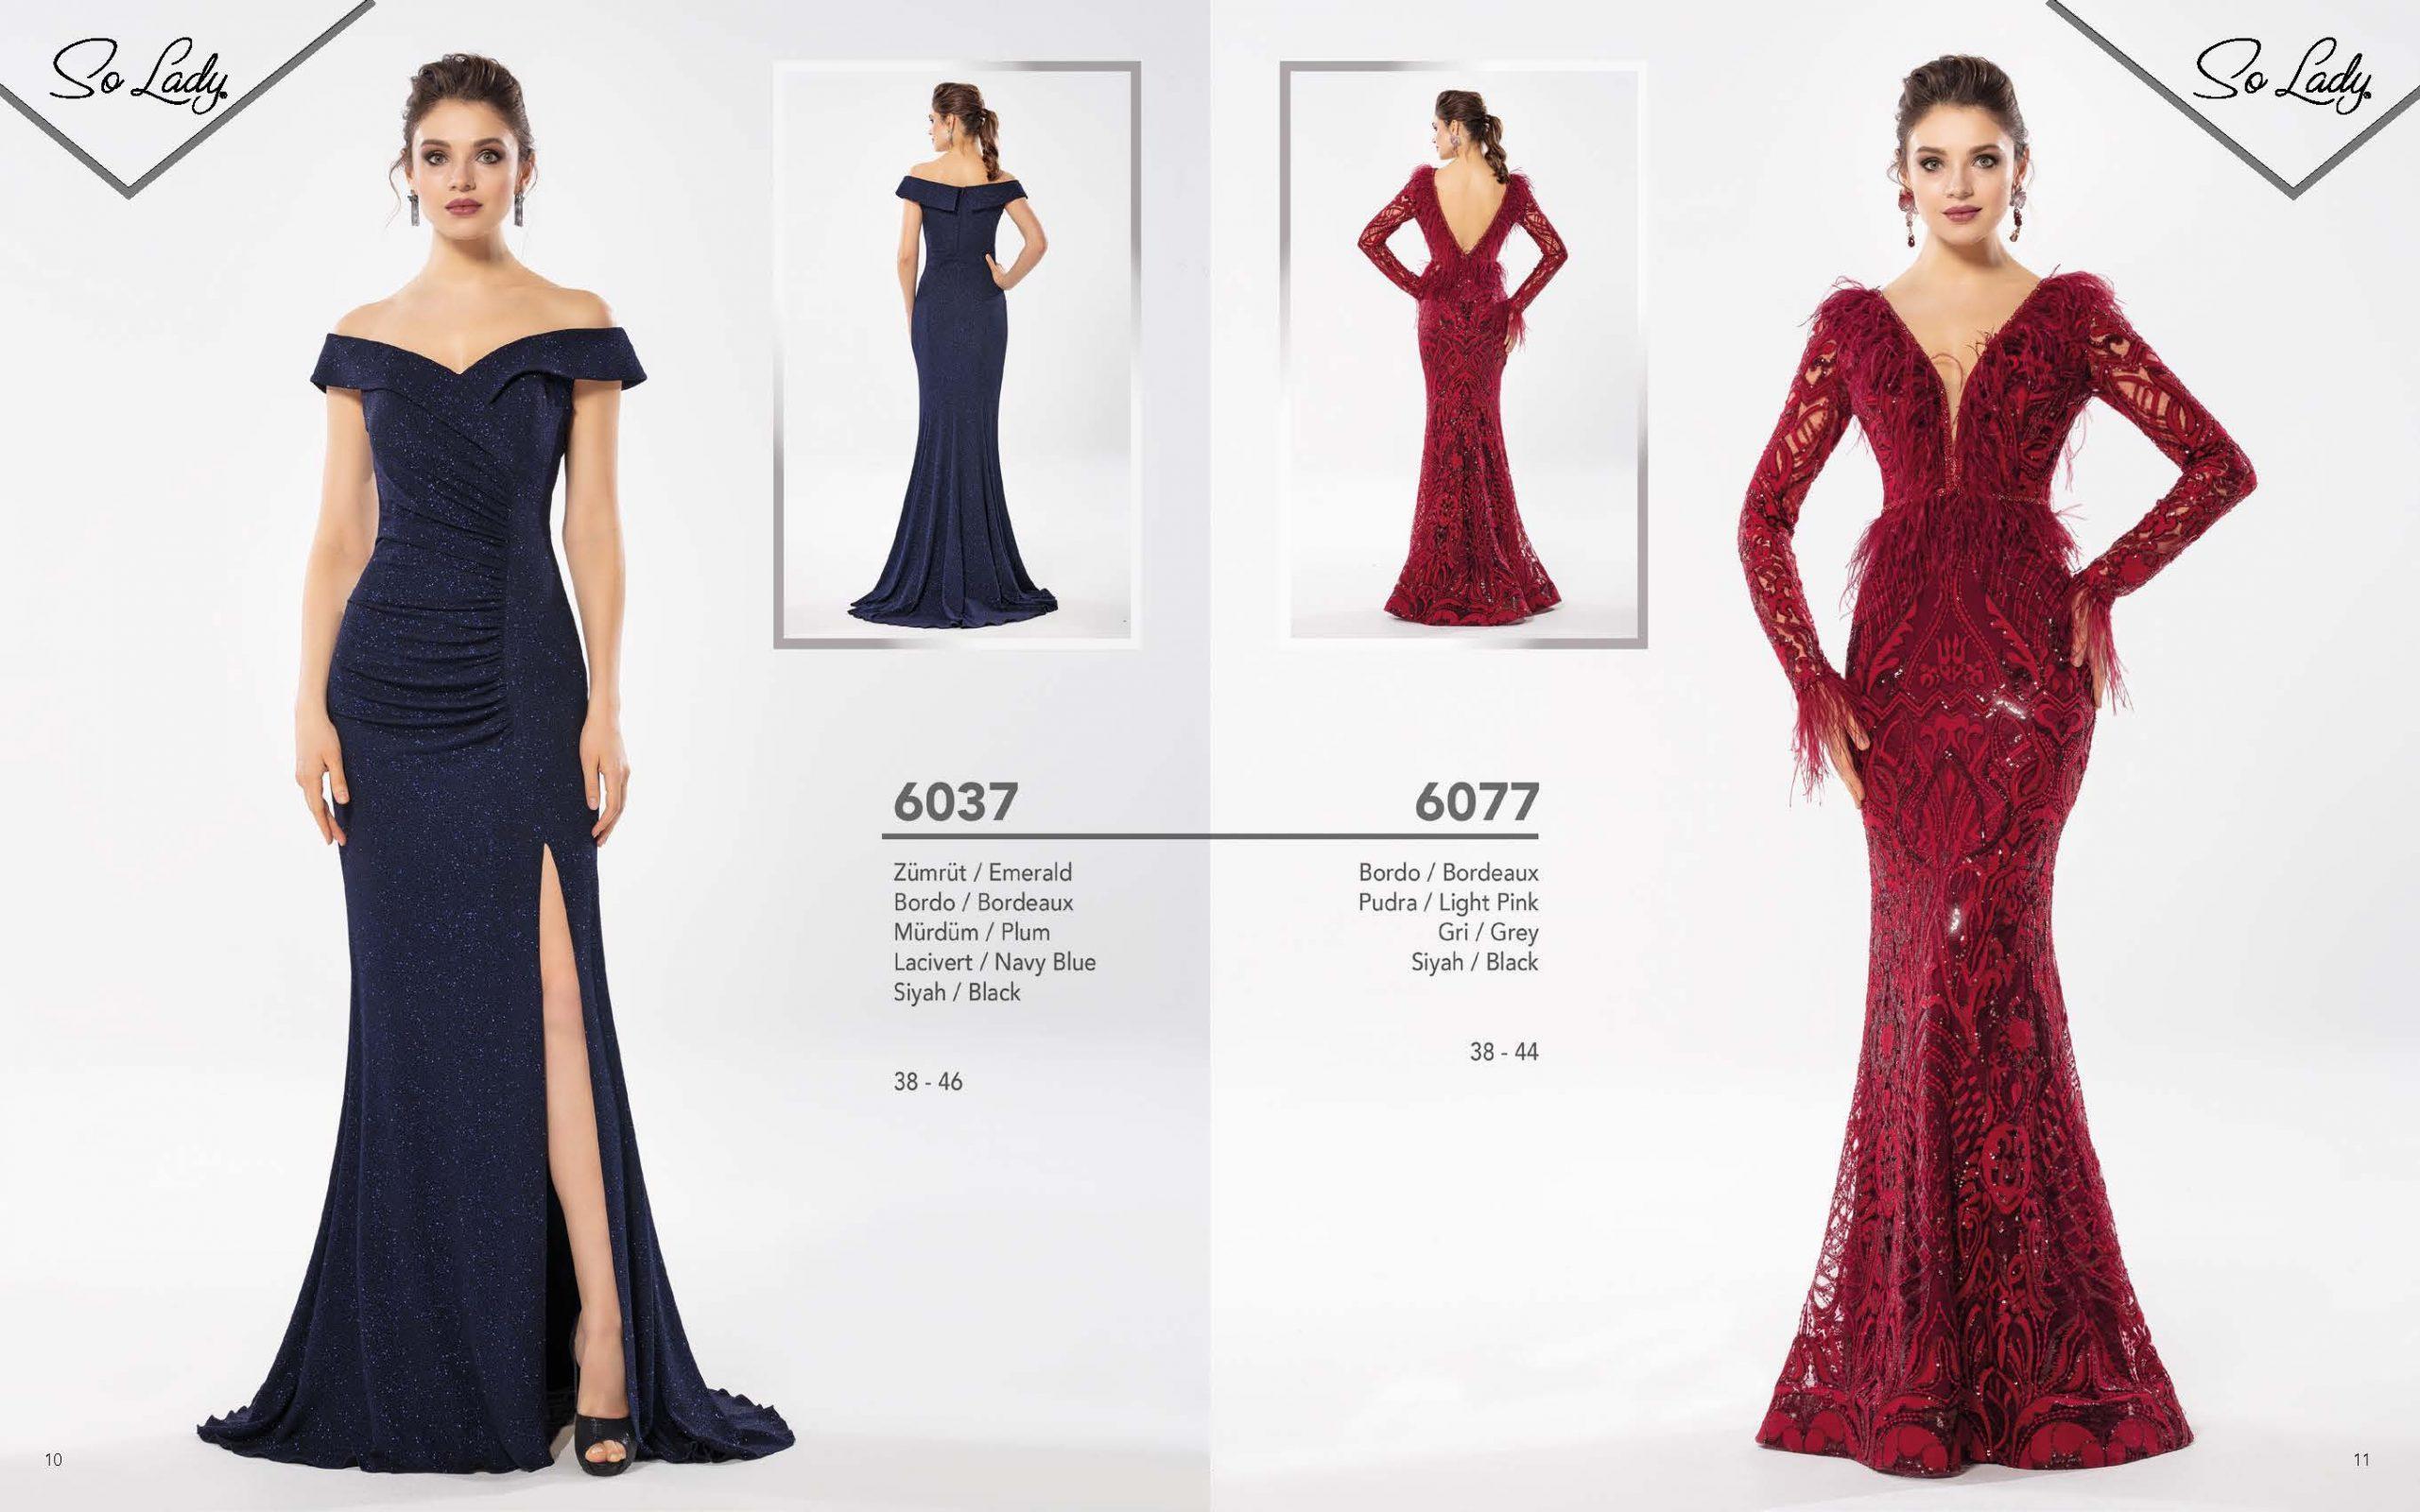 Designer Luxurius Abendkleid Nürnberg StylishAbend Wunderbar Abendkleid Nürnberg Ärmel